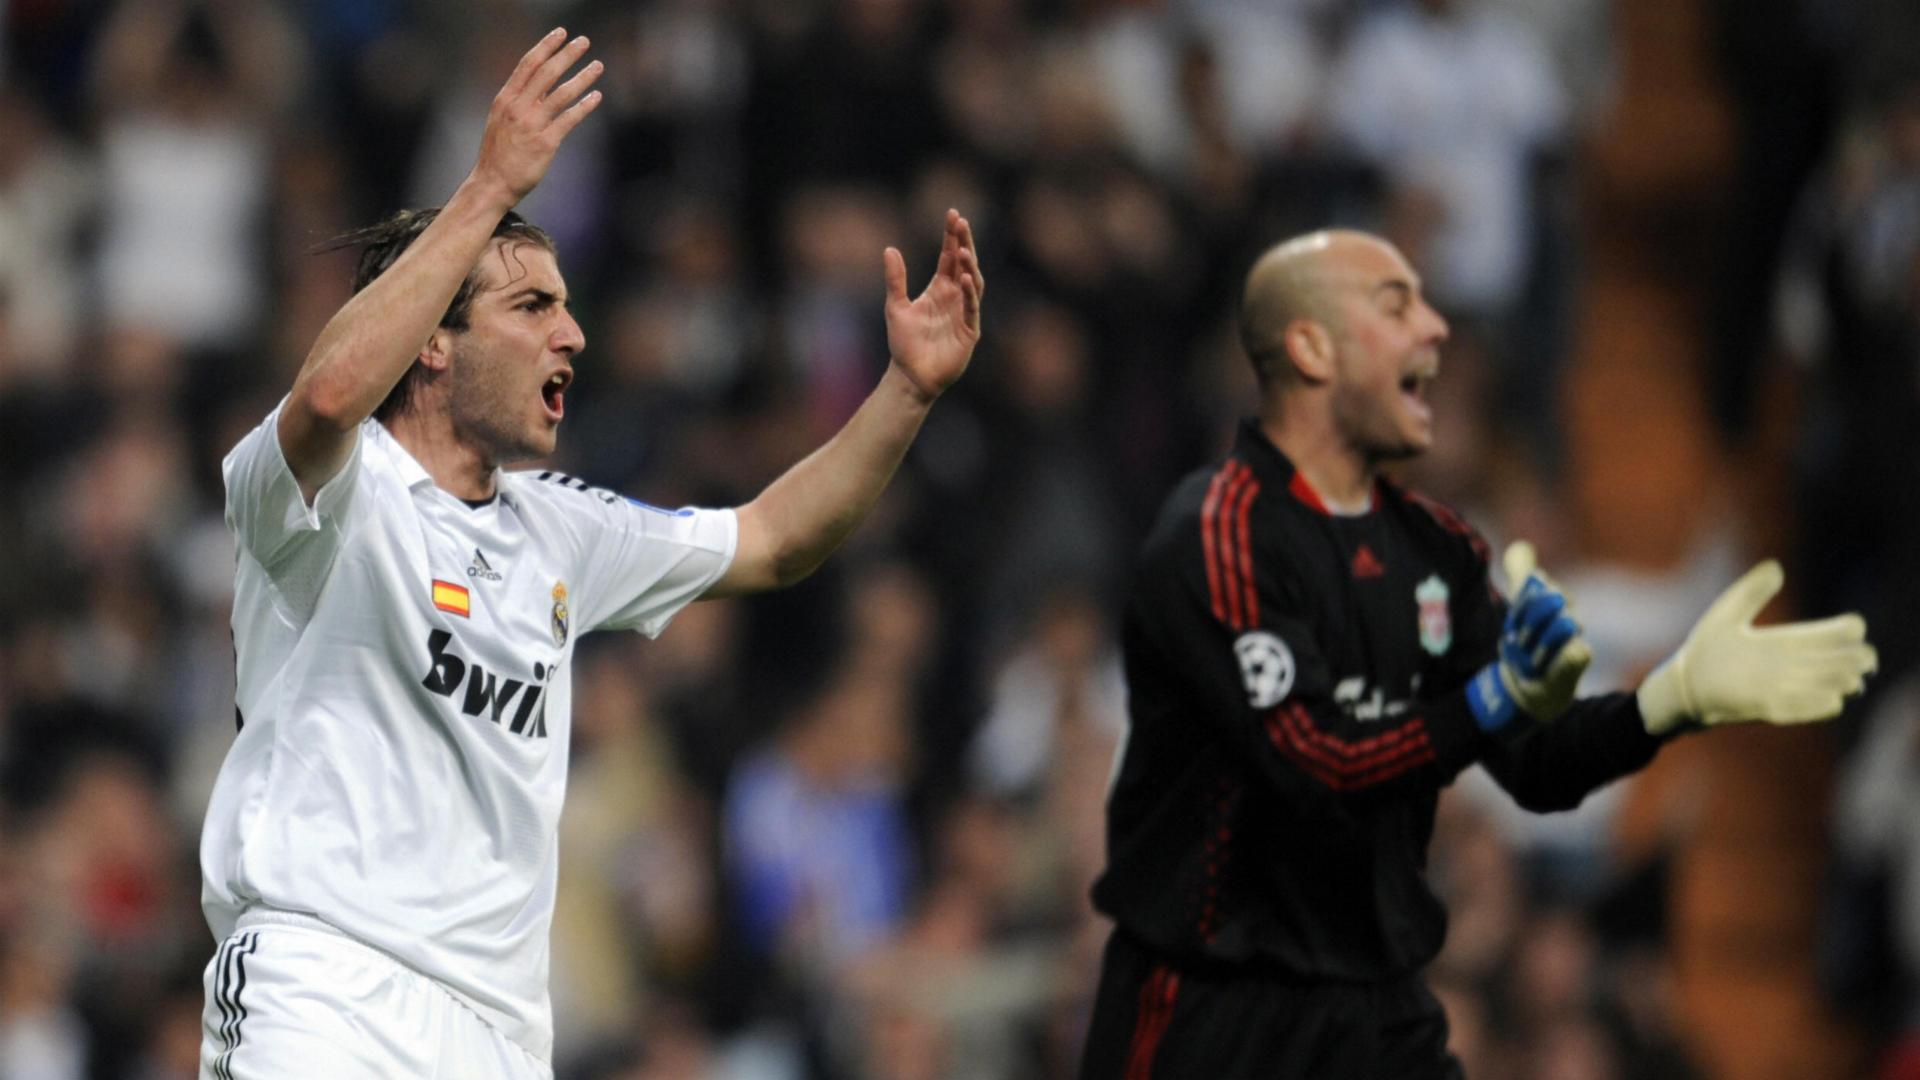 Gonzalo Higuain Pepe Reina Real Madrid Liverpool Champions League 2009